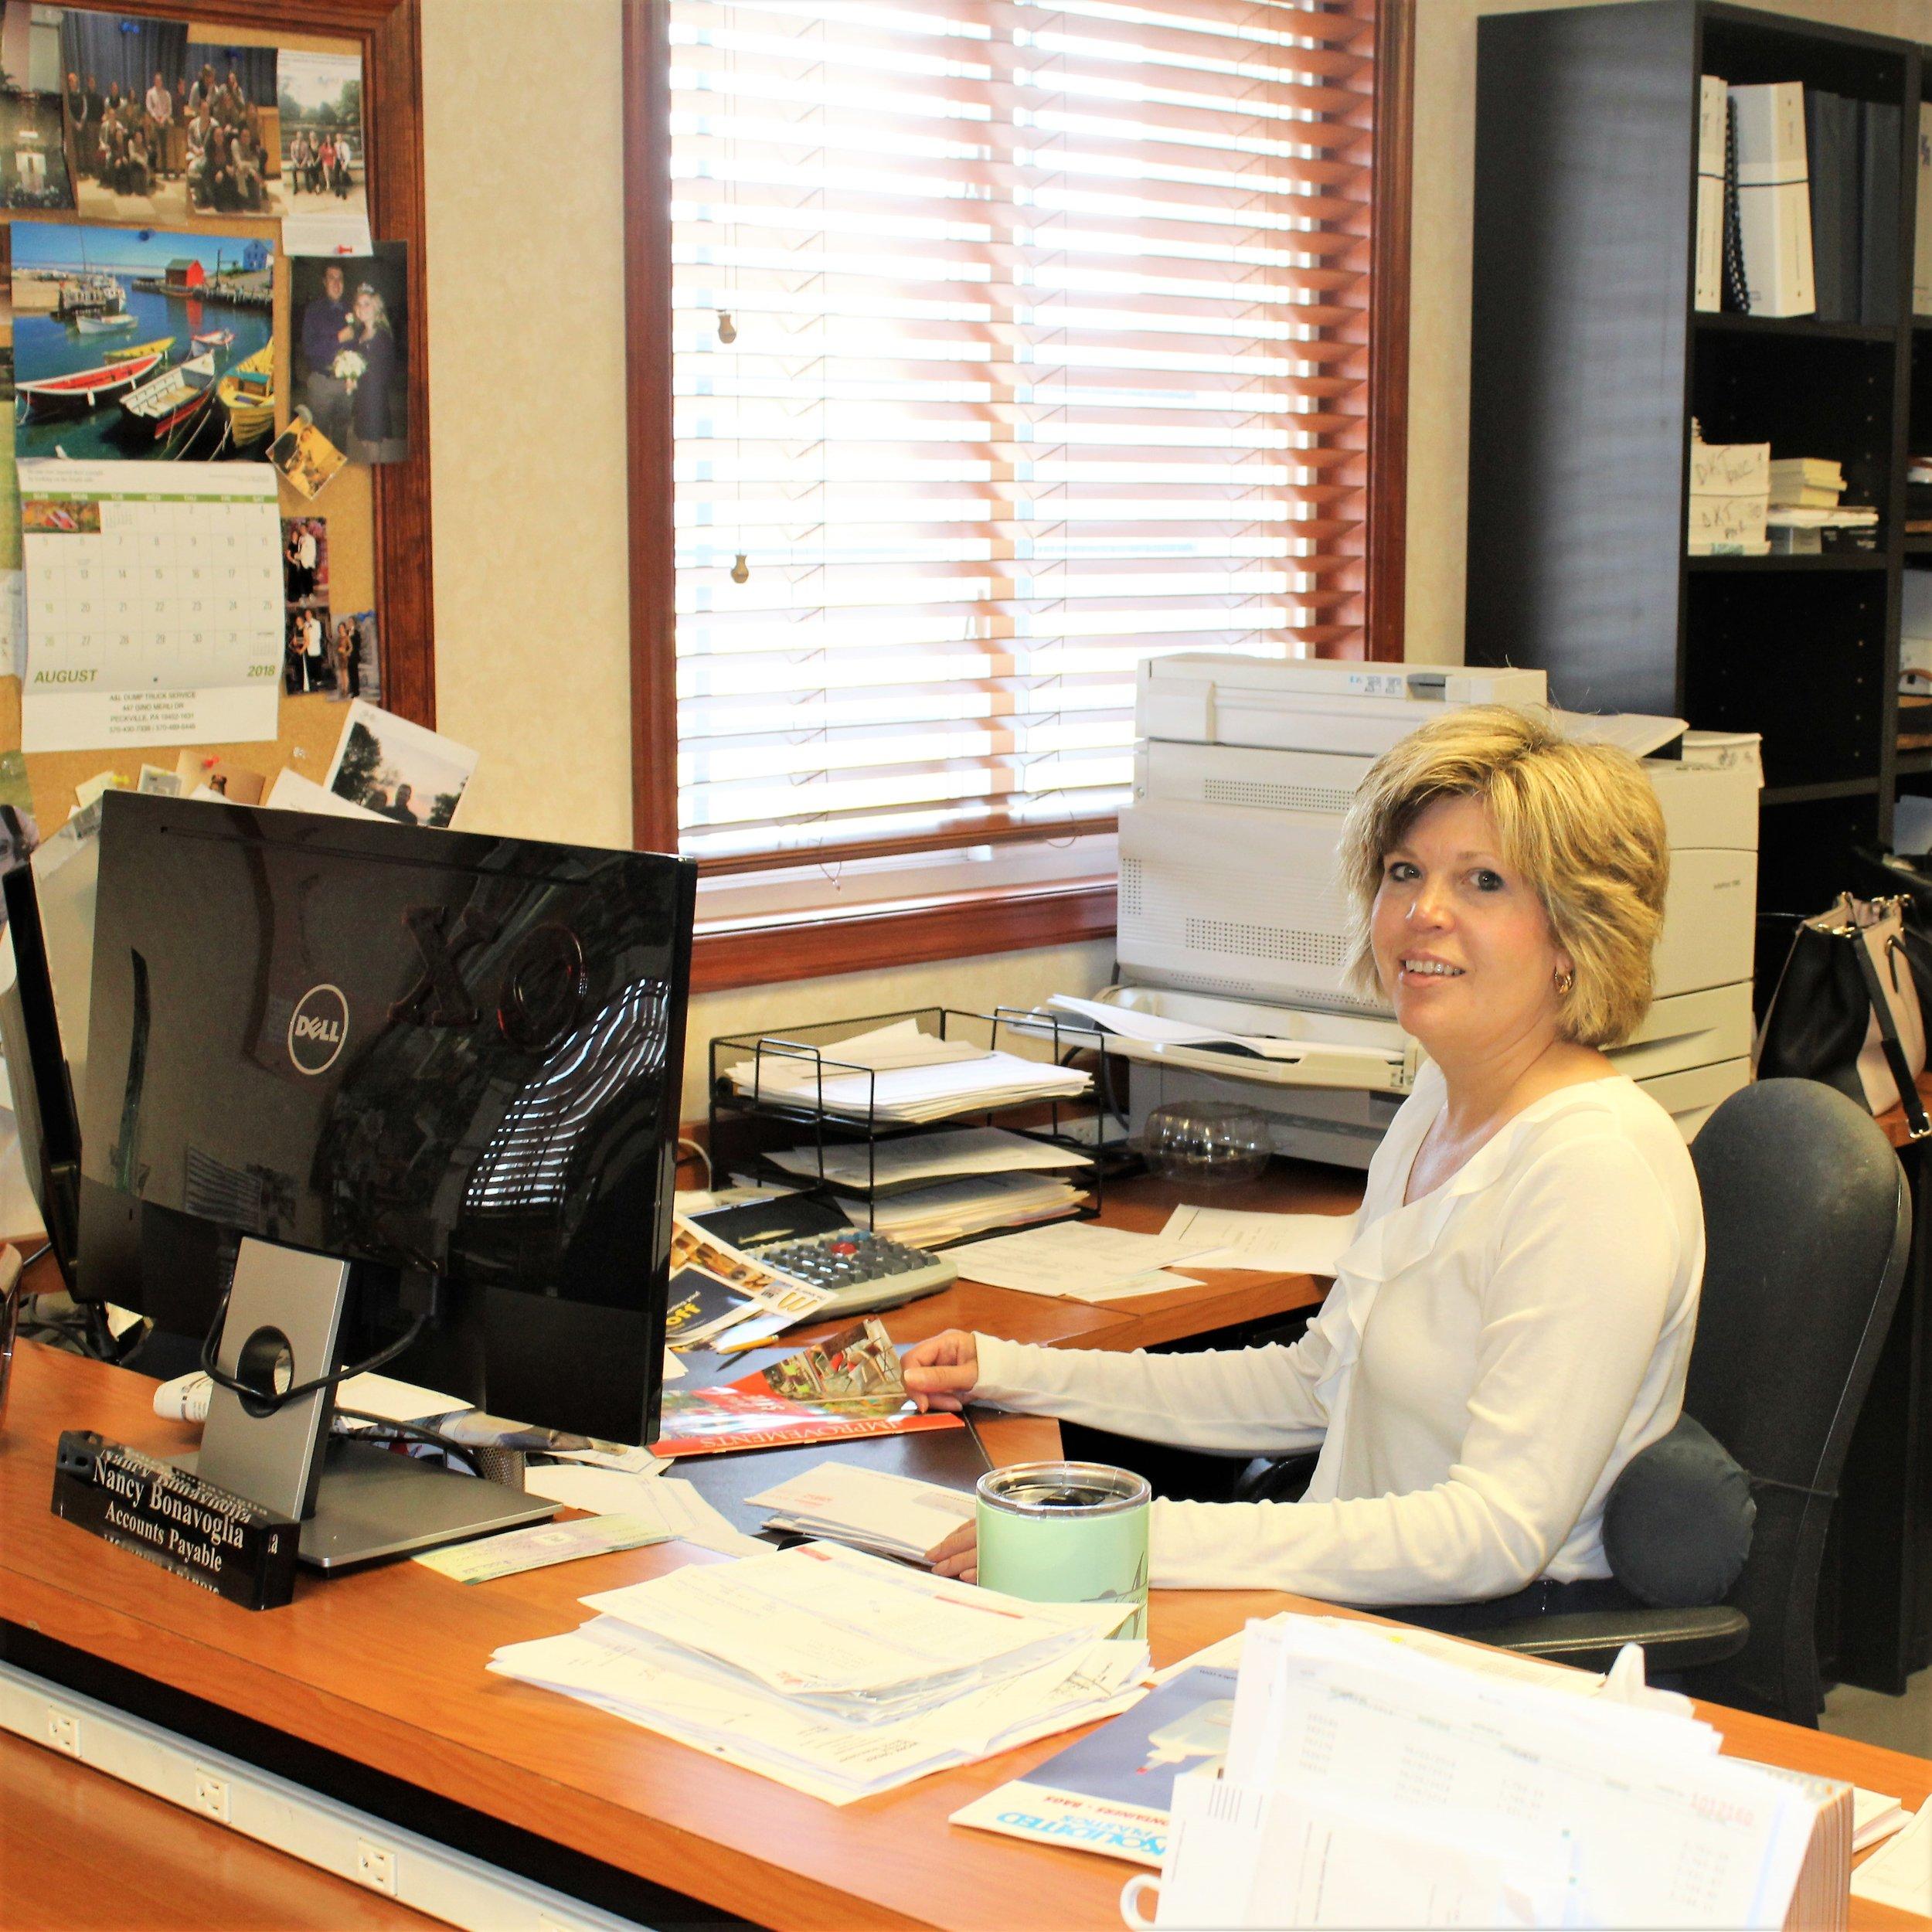 Nancy Bonavoglia, Accounts Payable